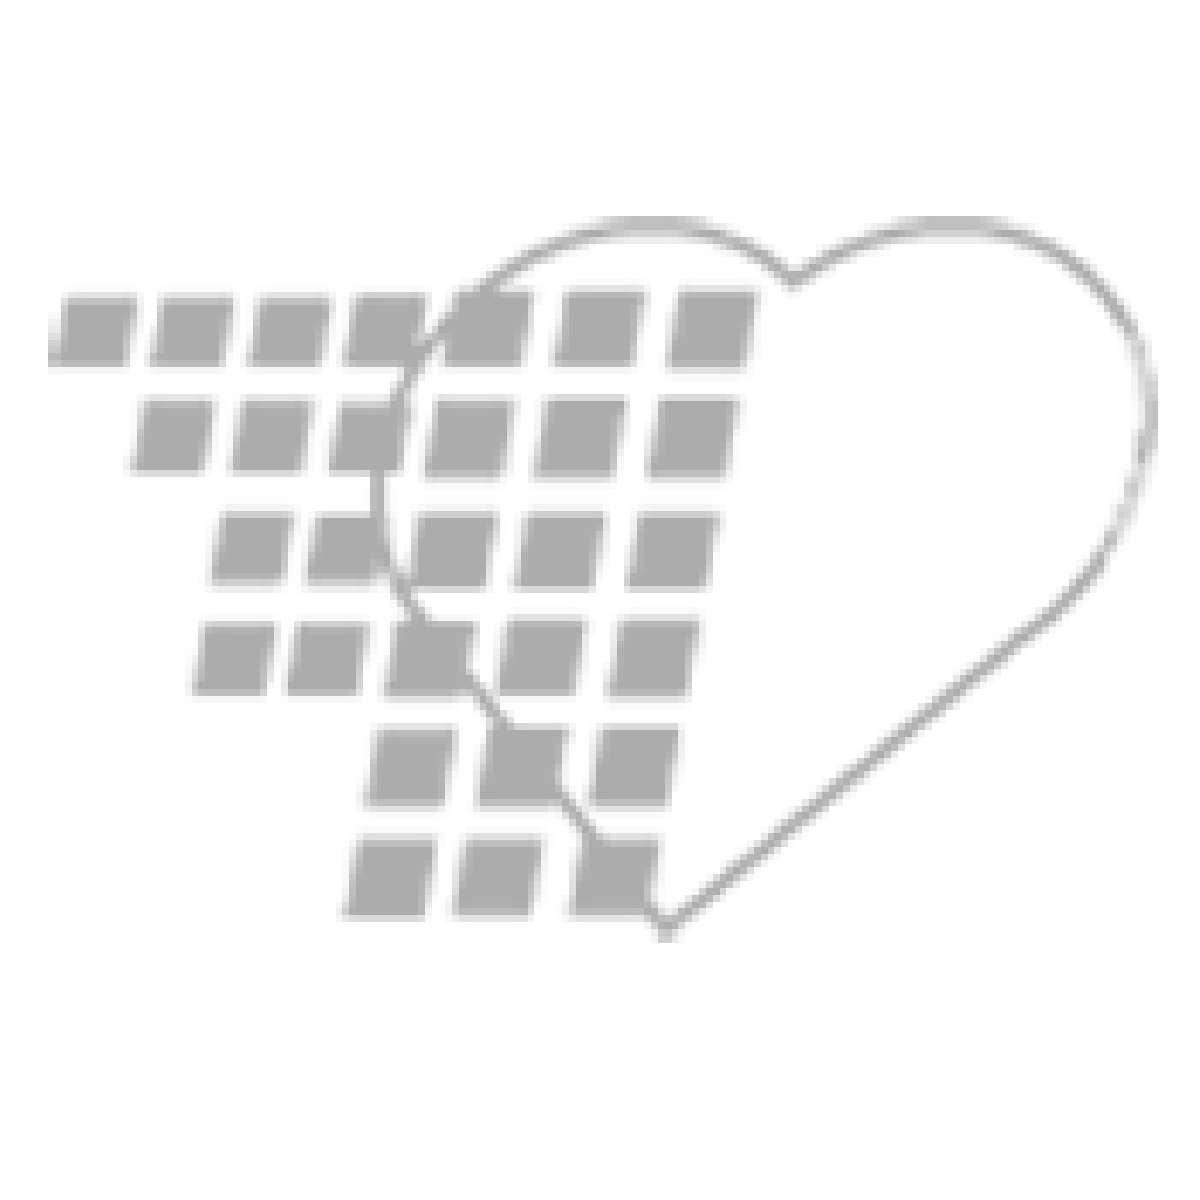 02-20-1441 Riester Babyphon Pediatric Sphygmomanometer Set